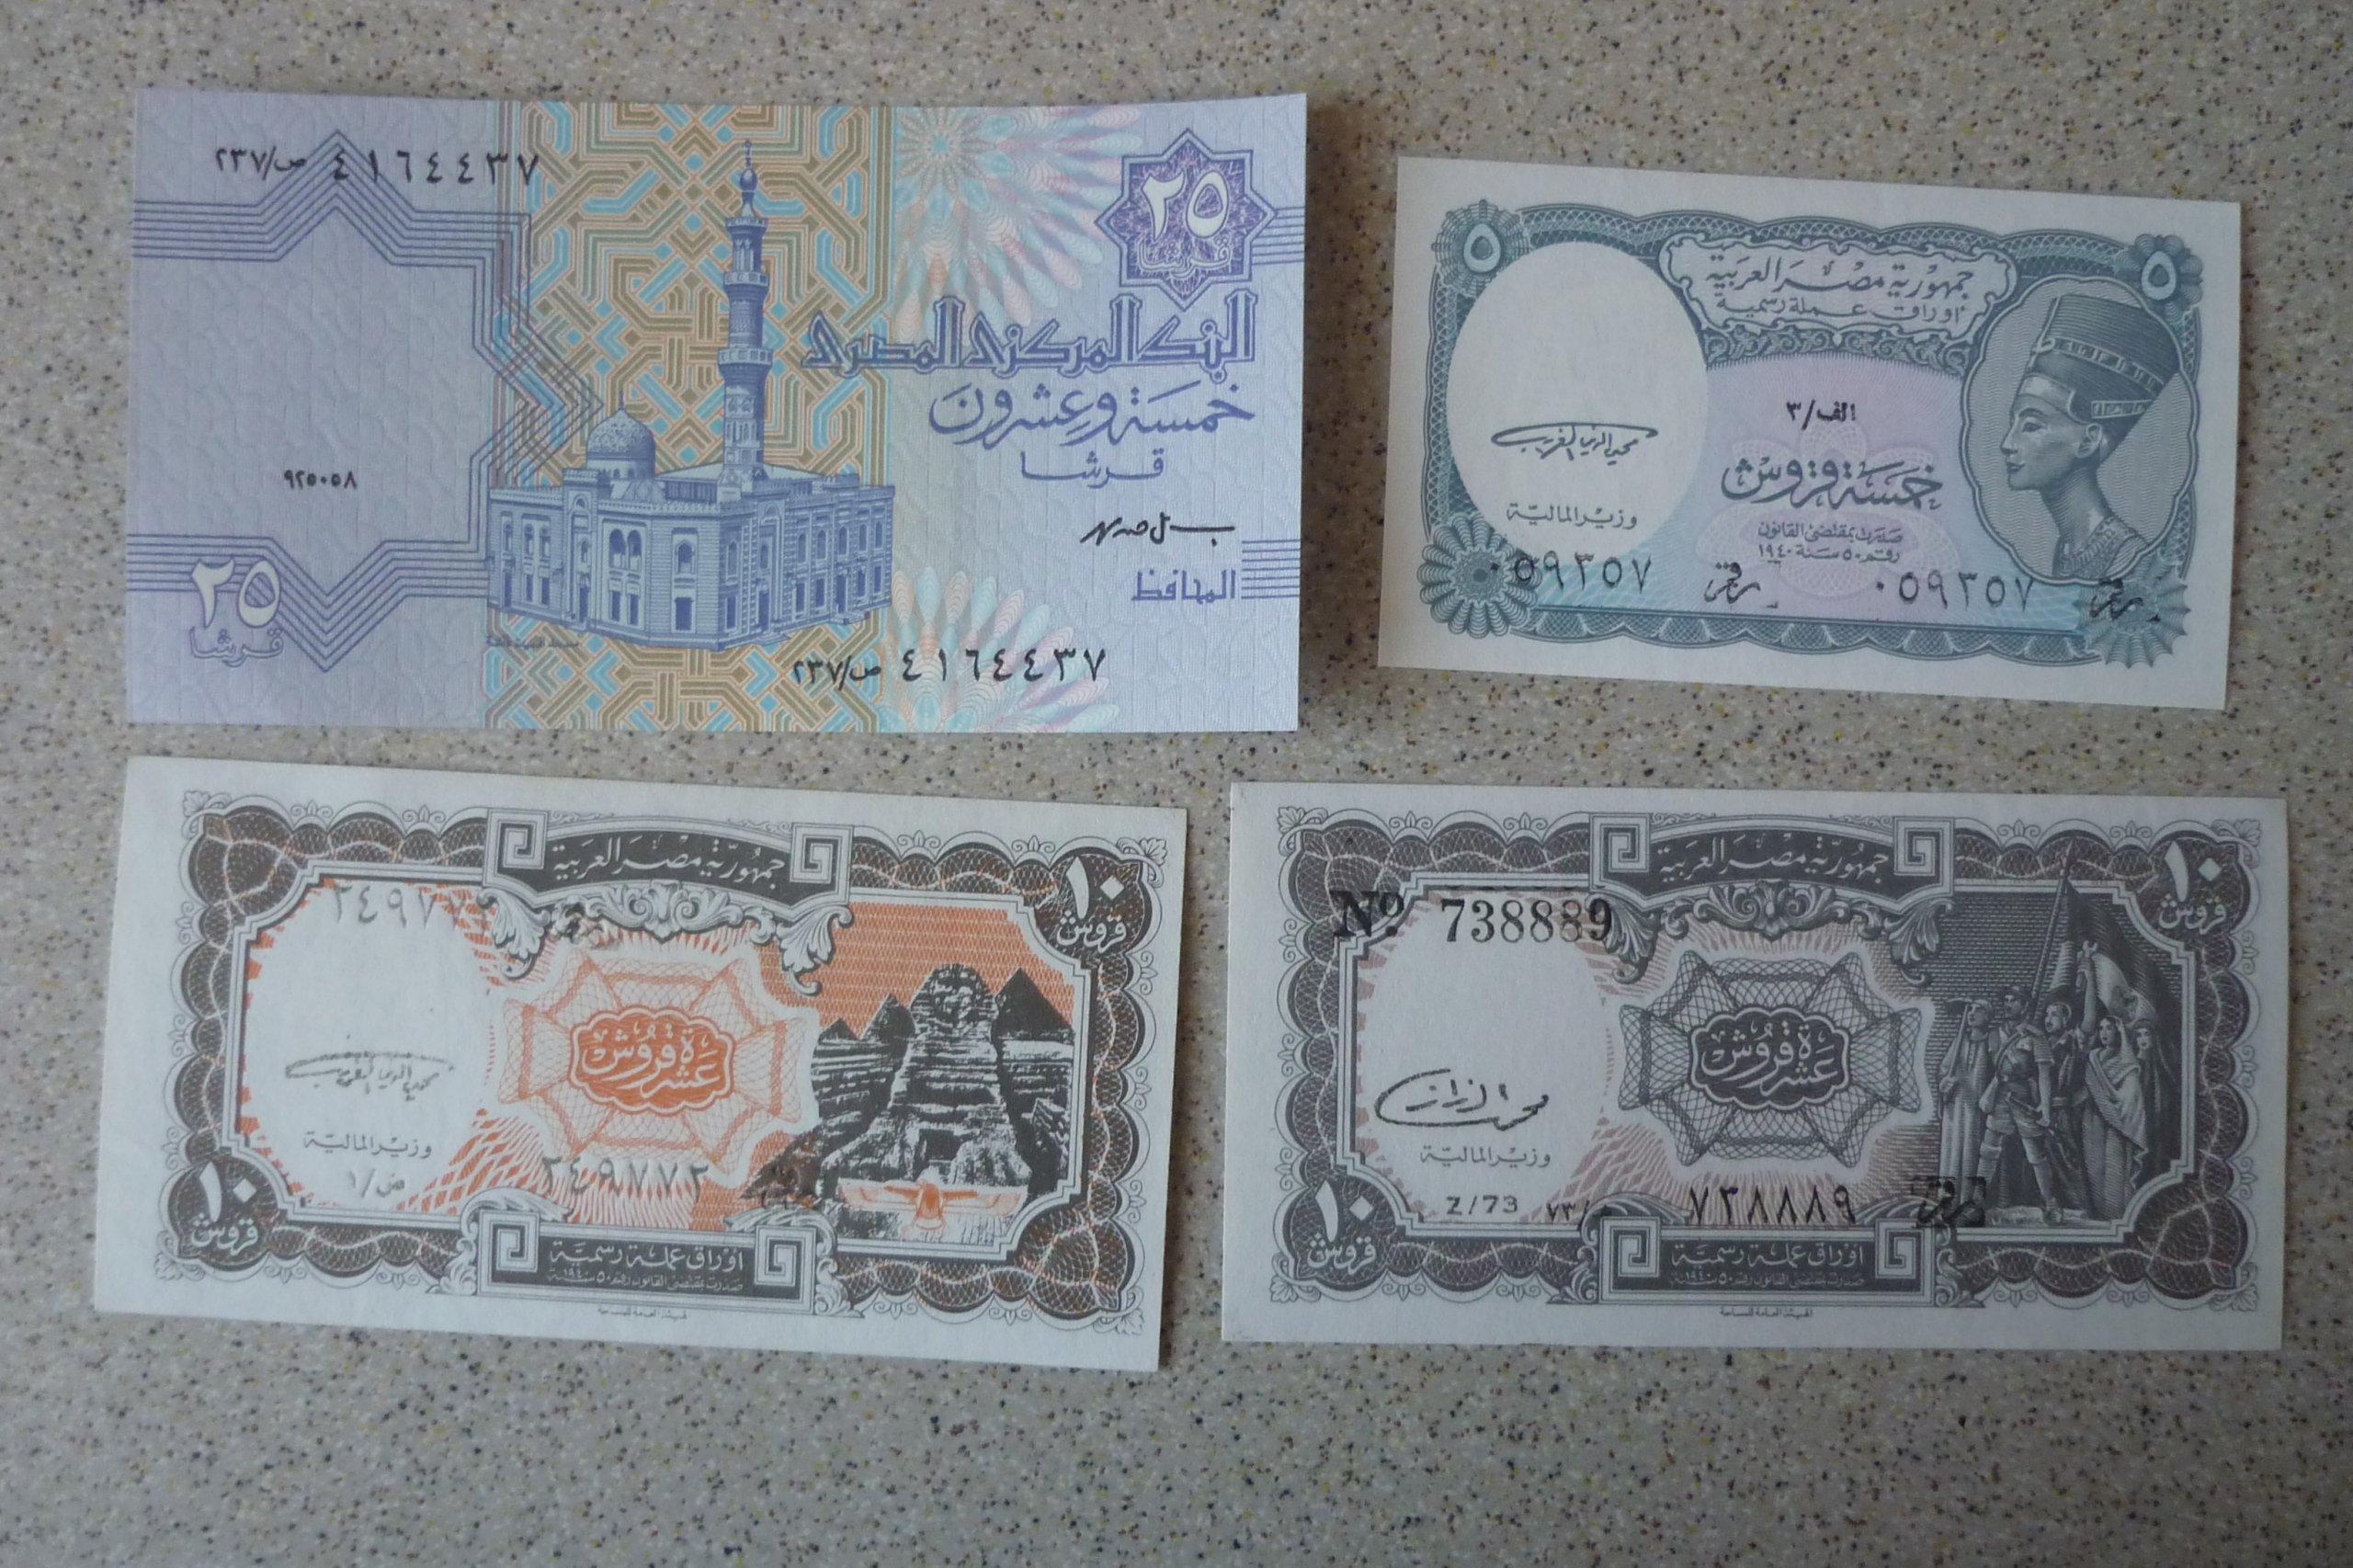 Egipt - 4 banknoty.